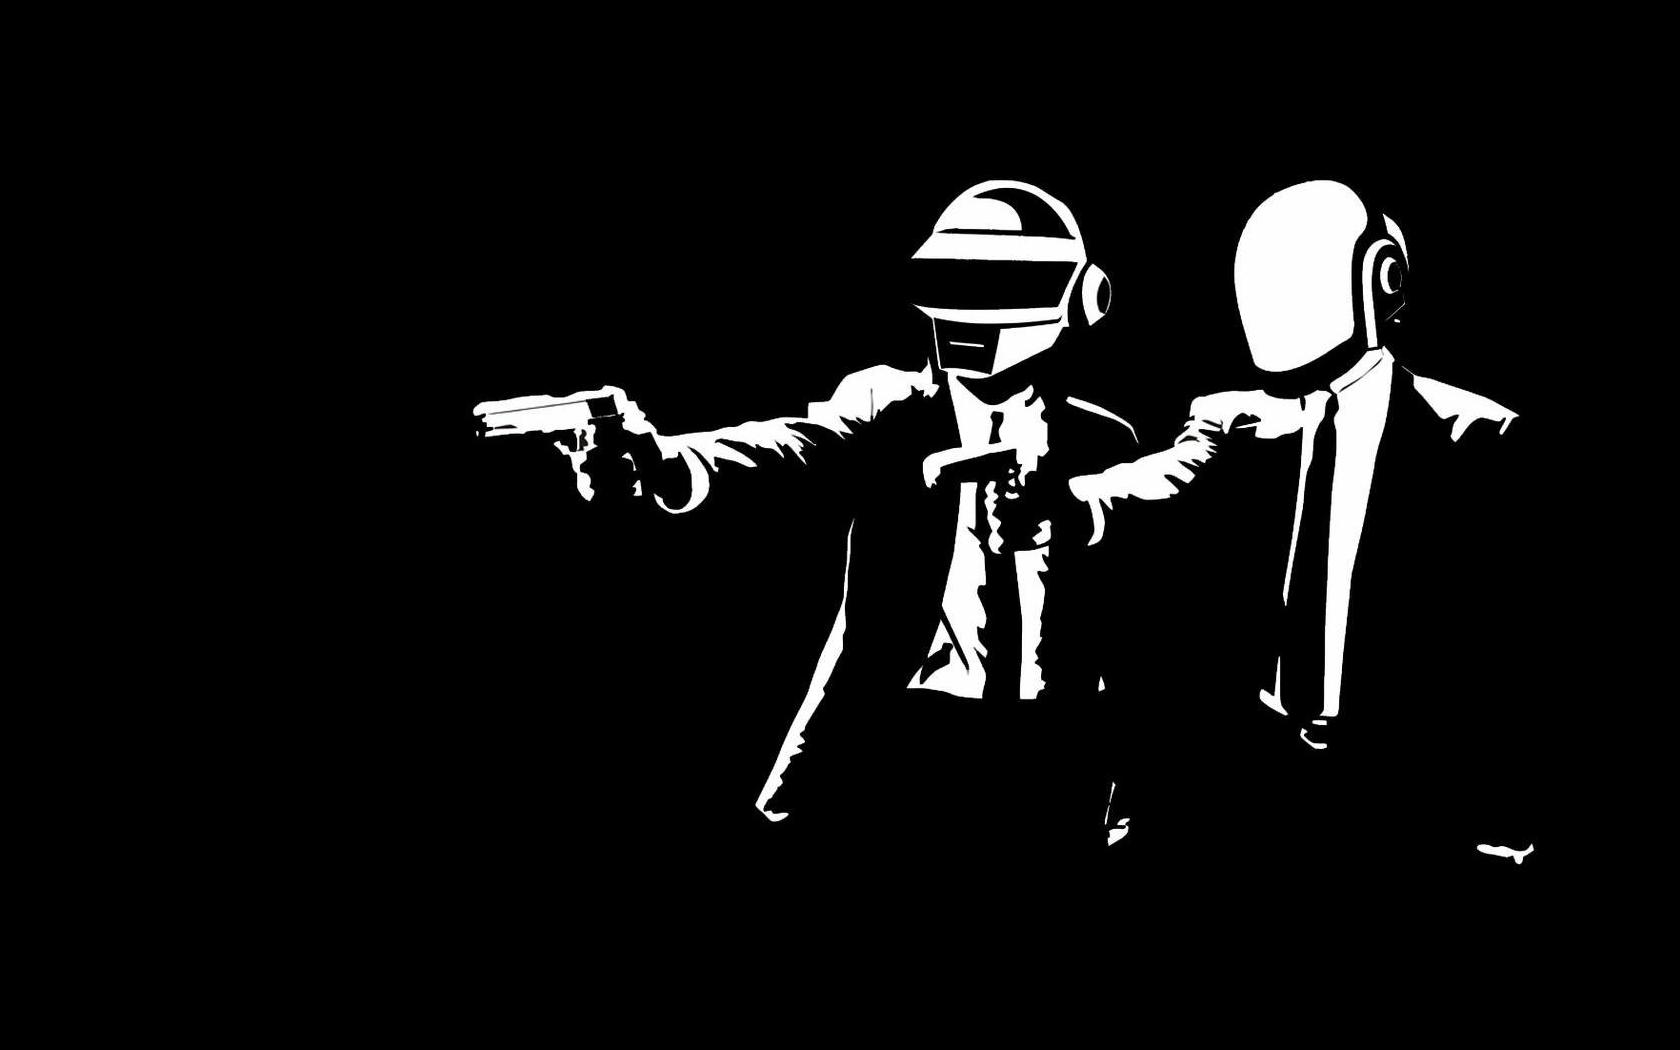 Dibujos de Daft Punk - 1680x1050